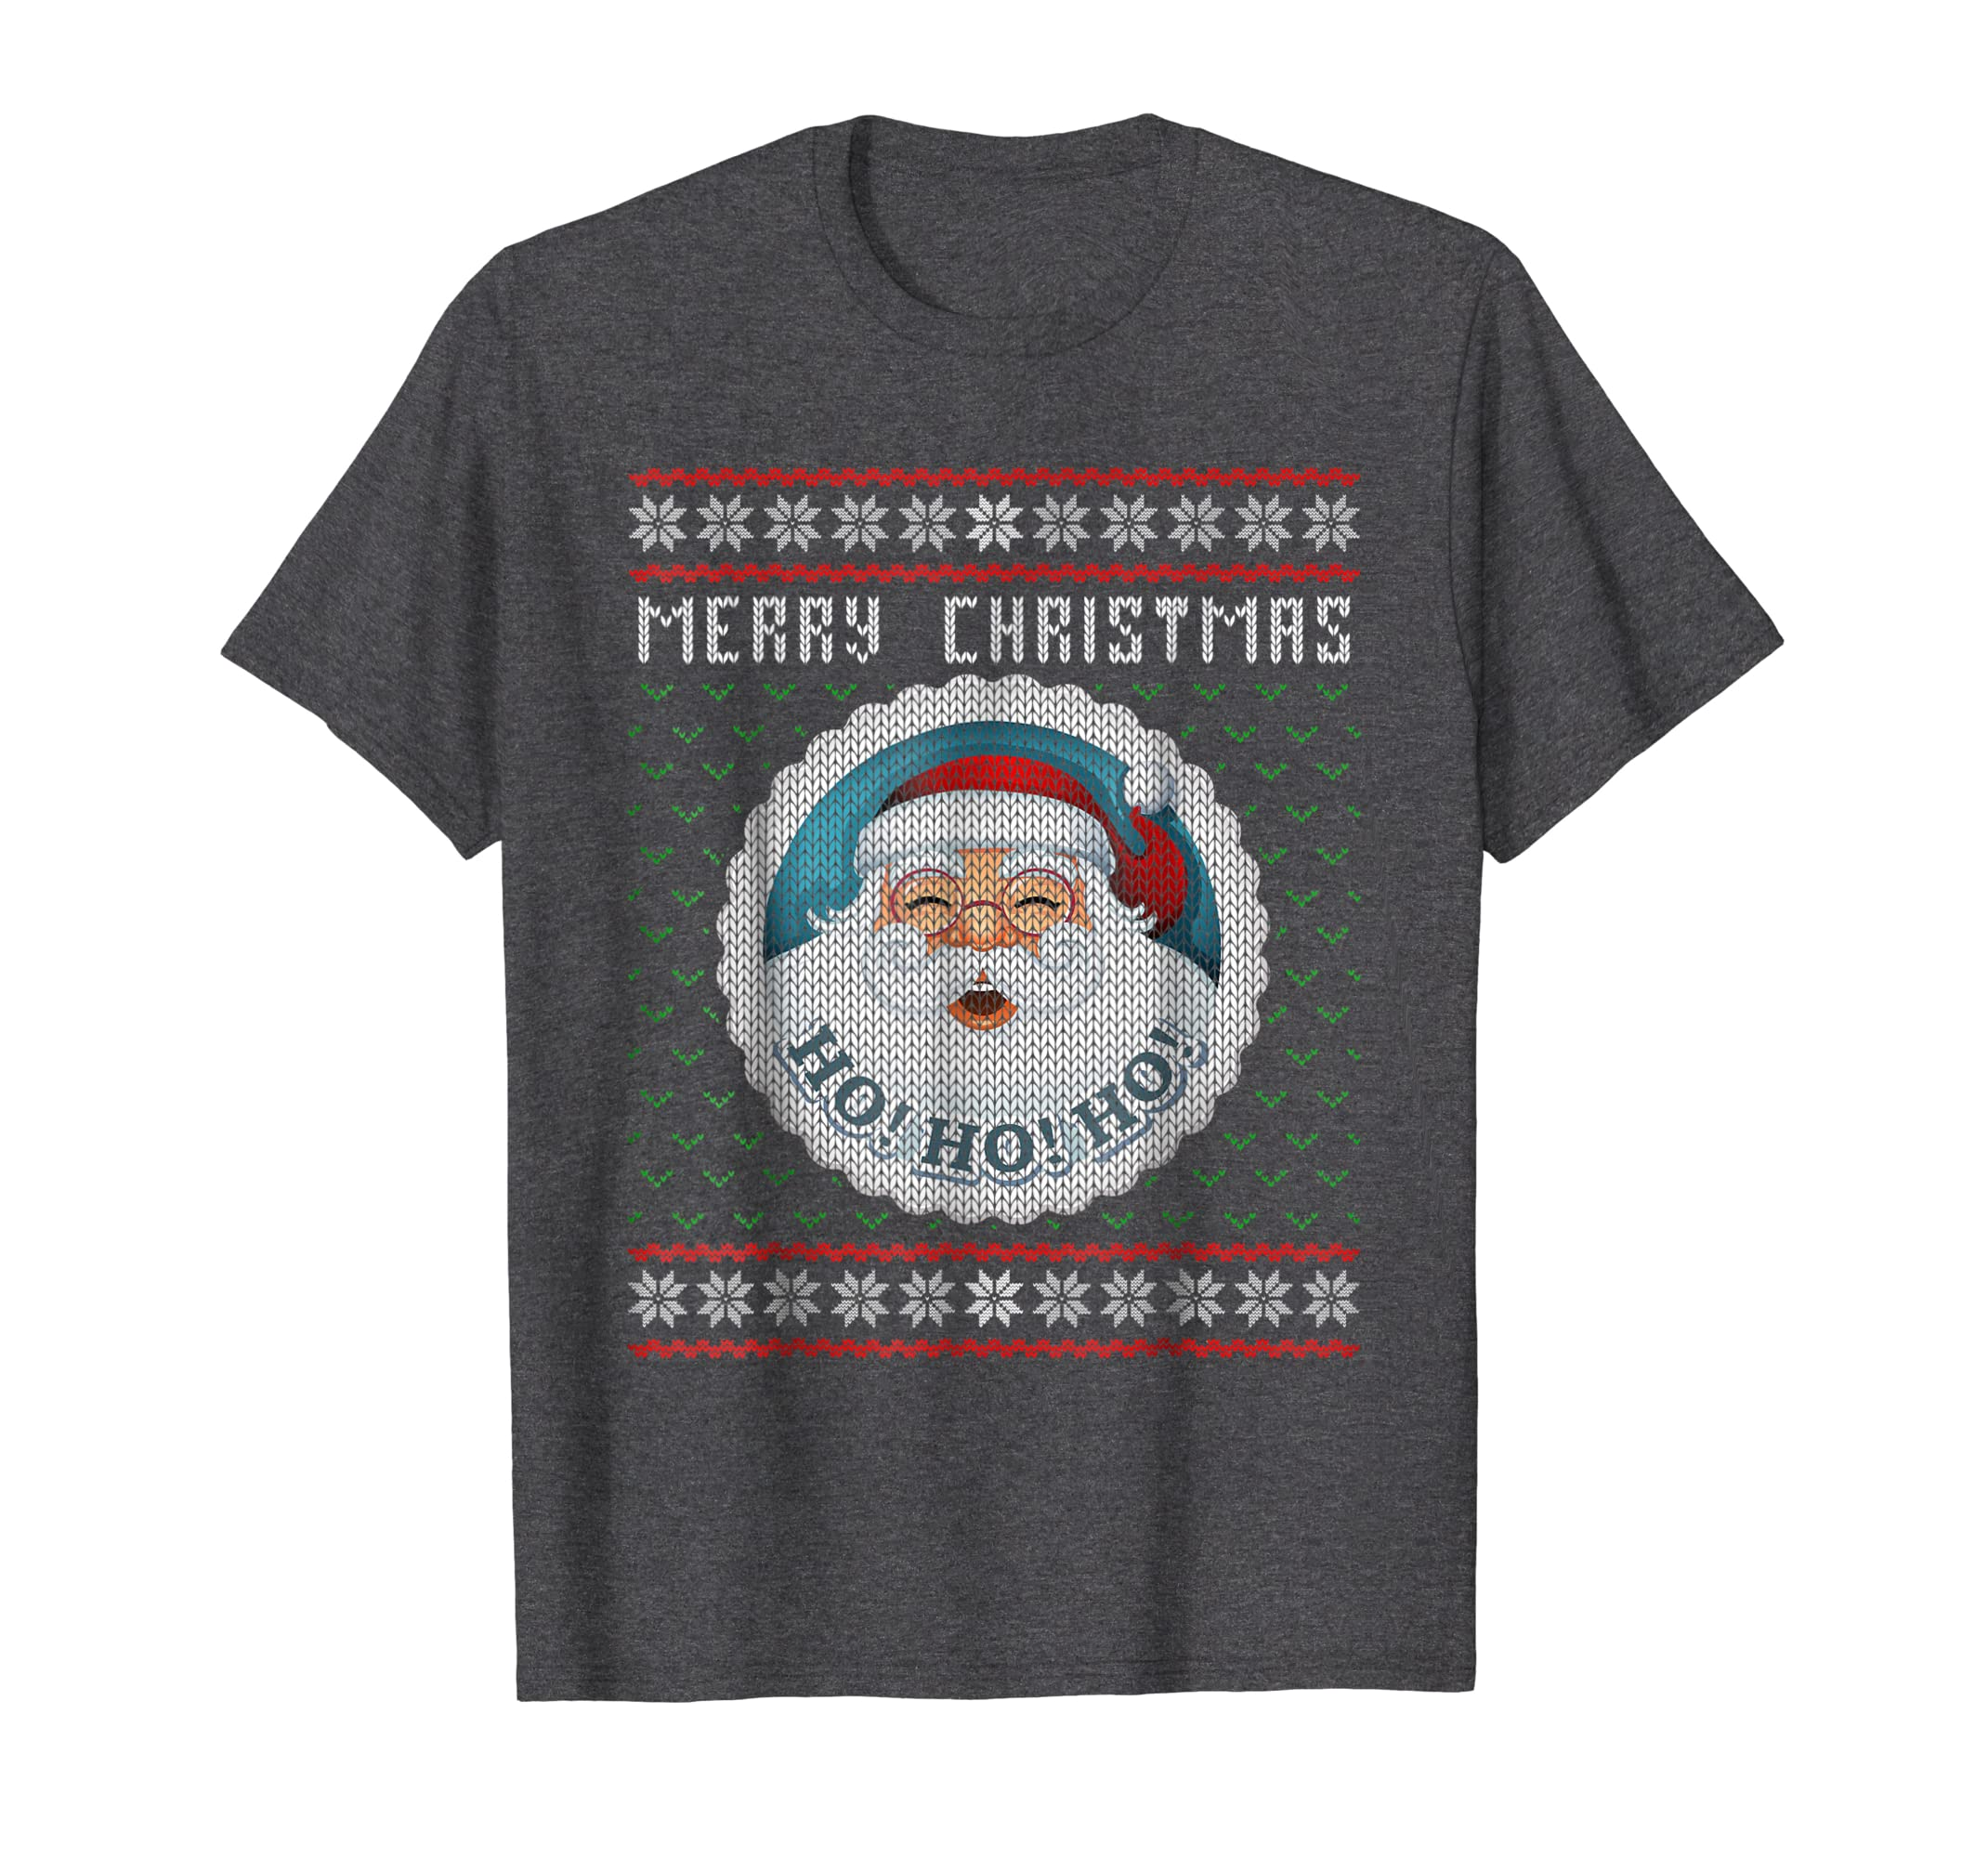 Merry Christmas Santa Ugly Christmas Sweater Style T Shirt-Teechatpro